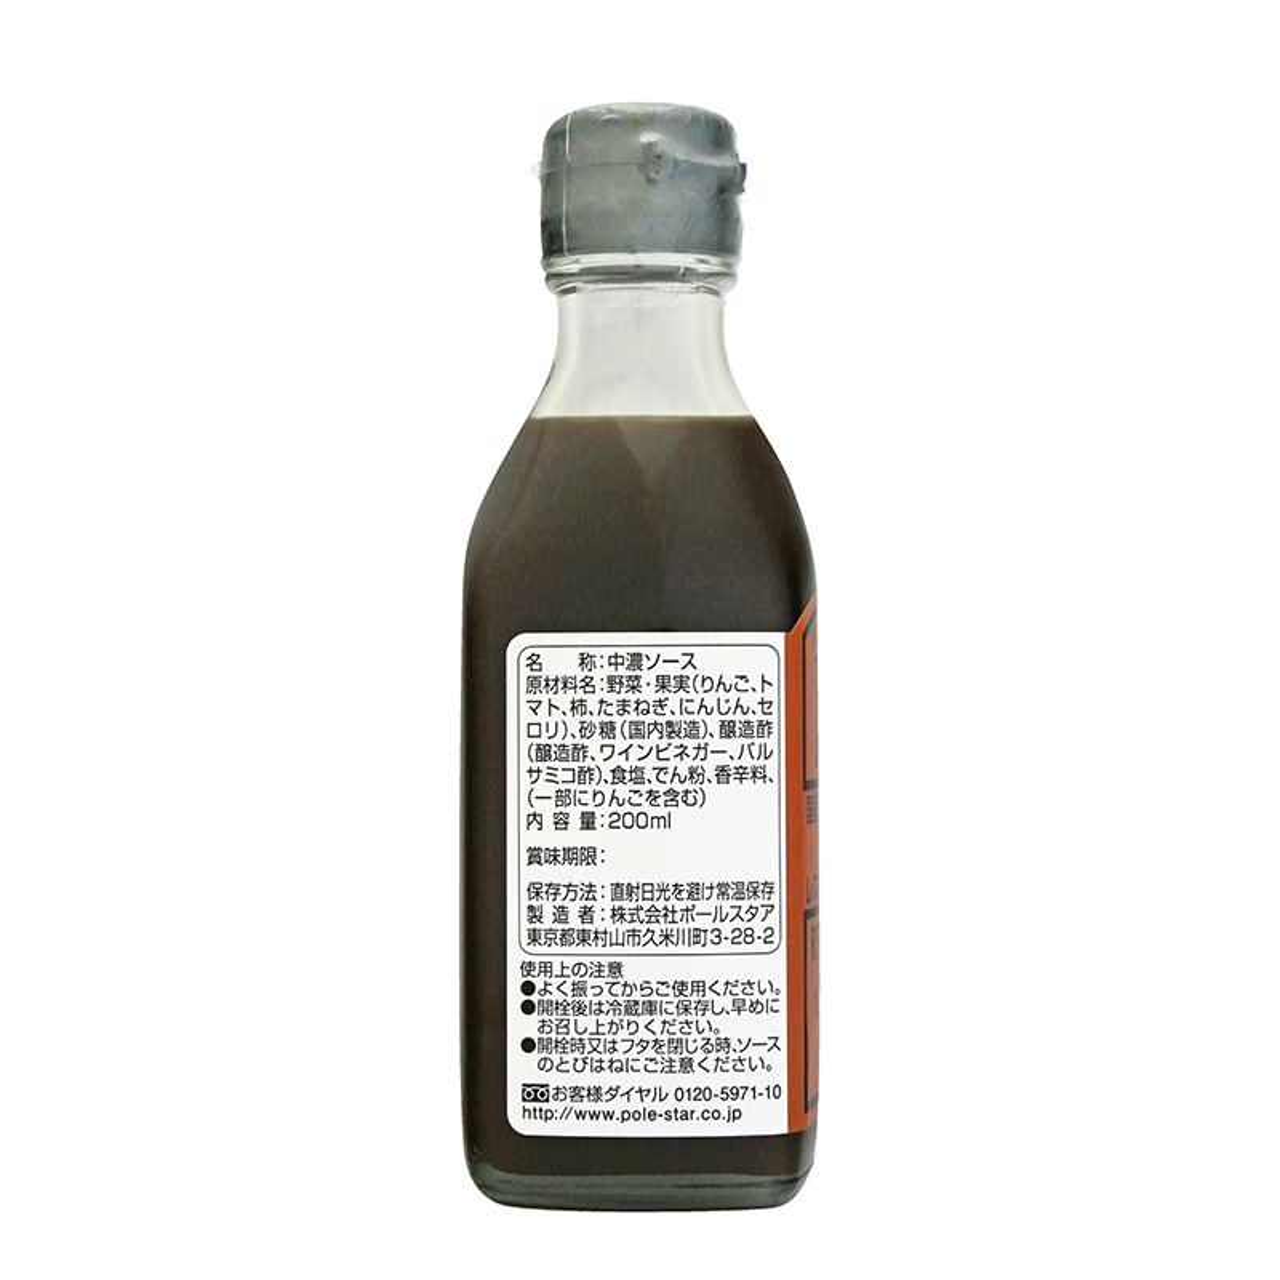 RS 国産〈野菜・果実〉中濃 レストランソース 200ml